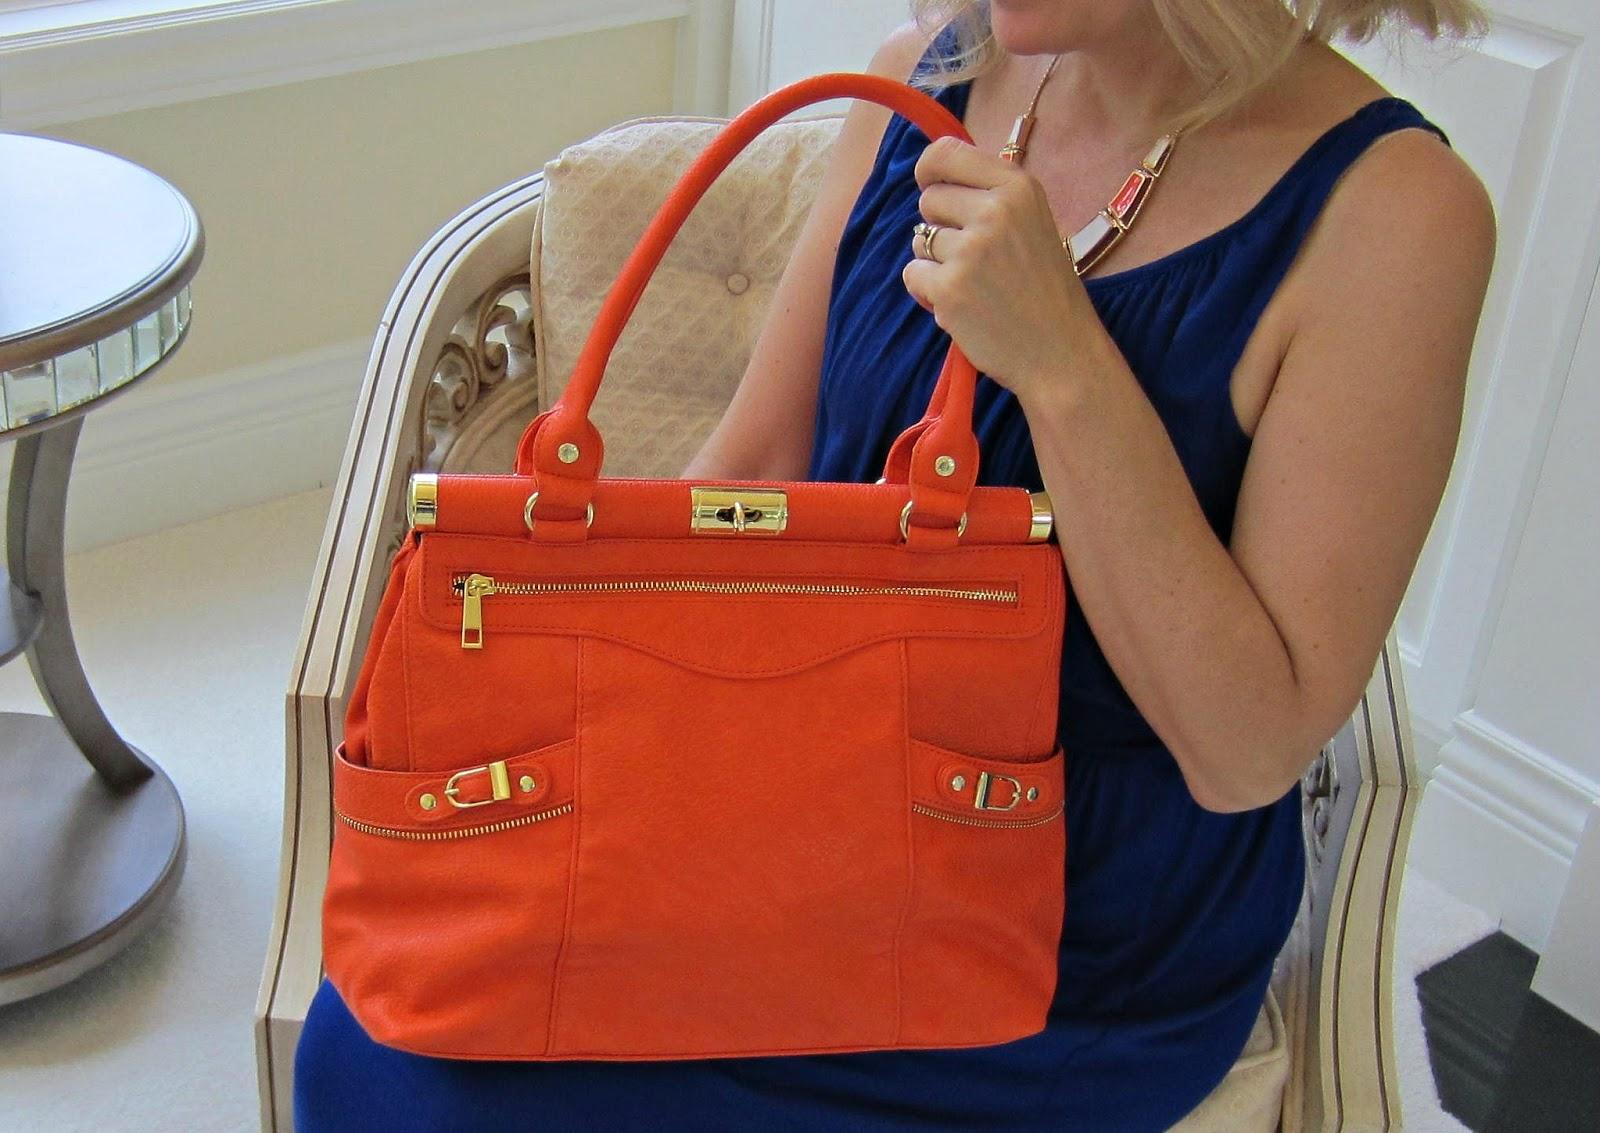 Olivia Joy Handbags Exude Style Review Giveaway